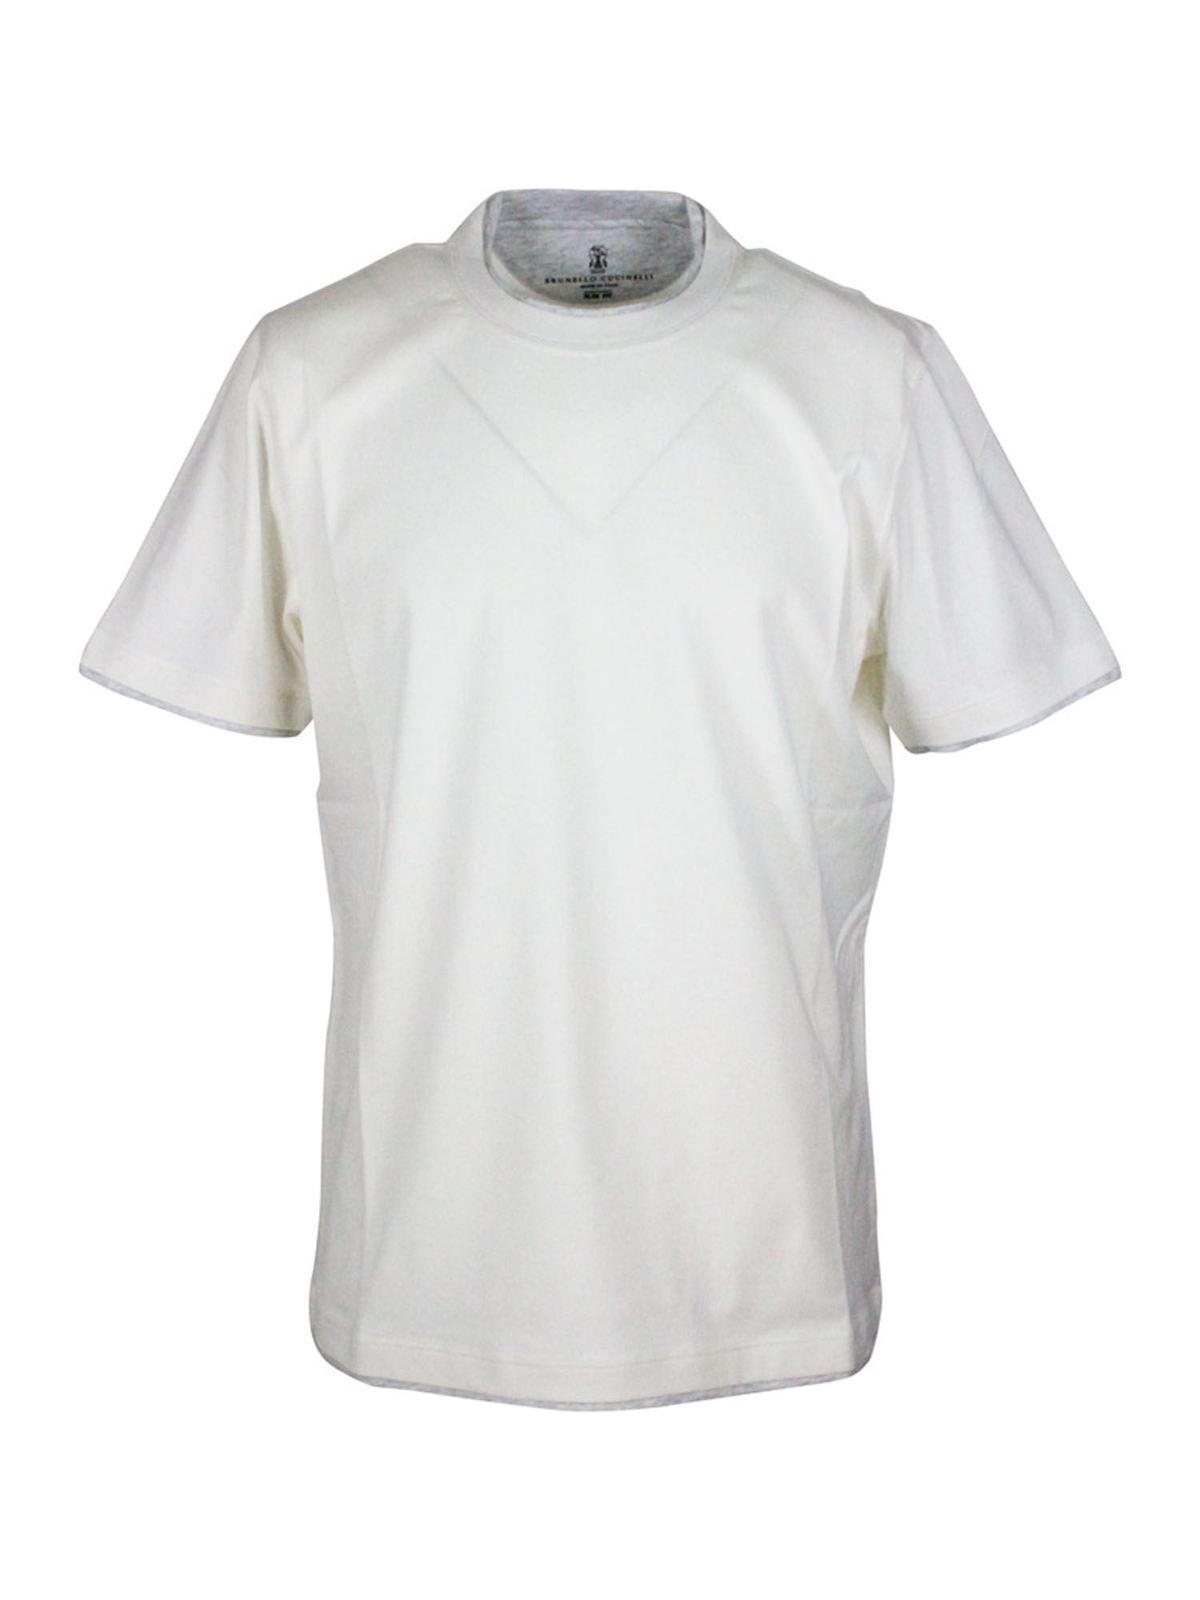 Brunello Cucinelli SLIM FIT T-SHIRT IN WHITE